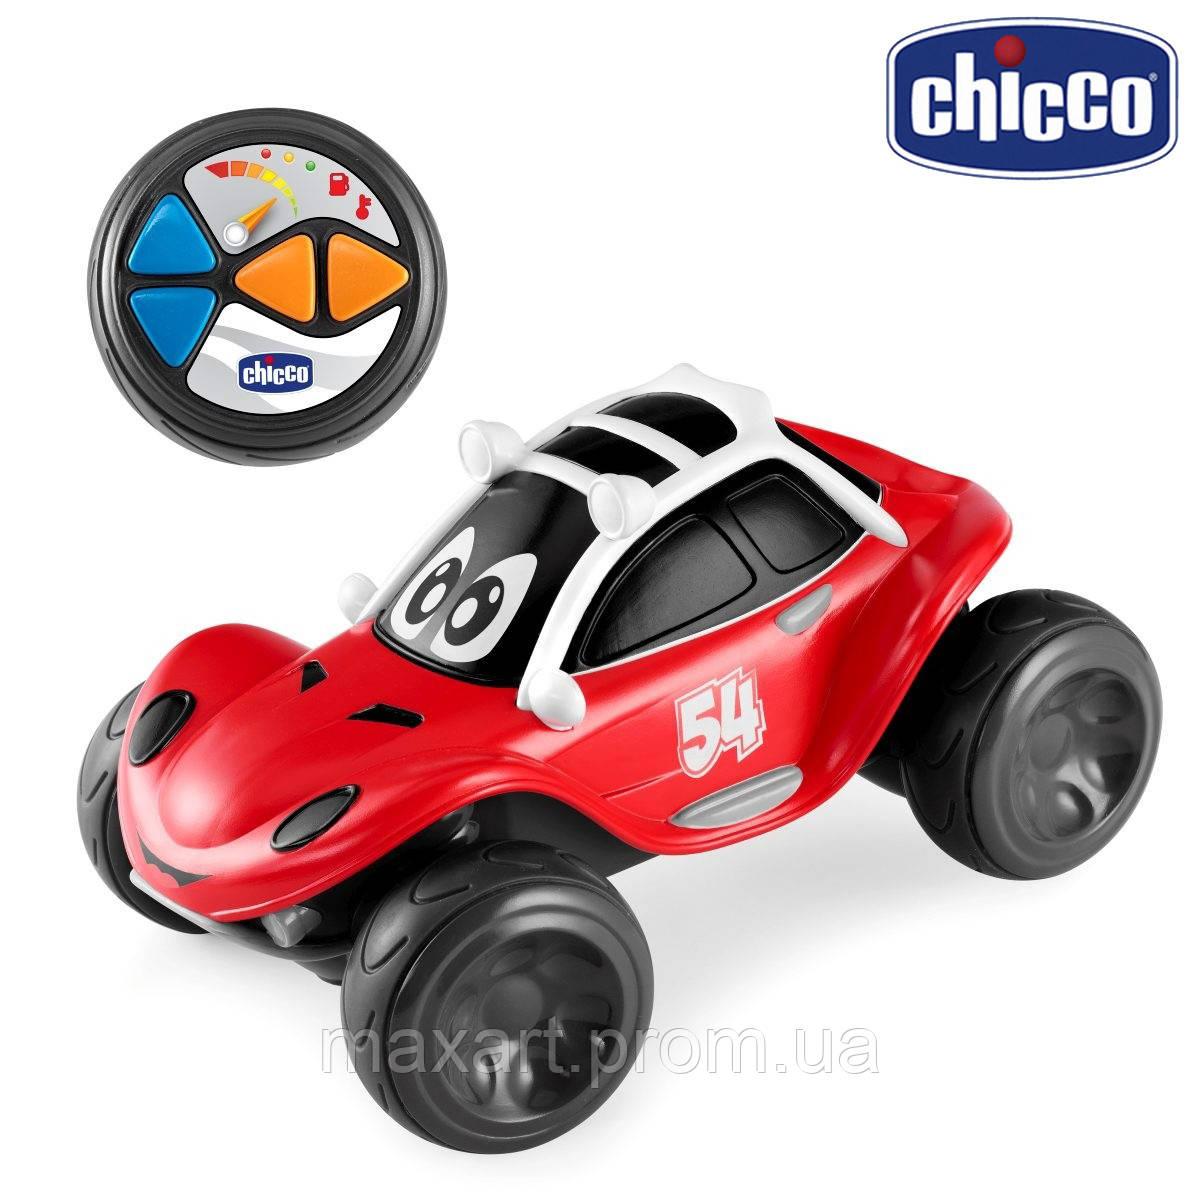 Машинка Chicco - Бобби Багги (09152.00) на радиоуправлении